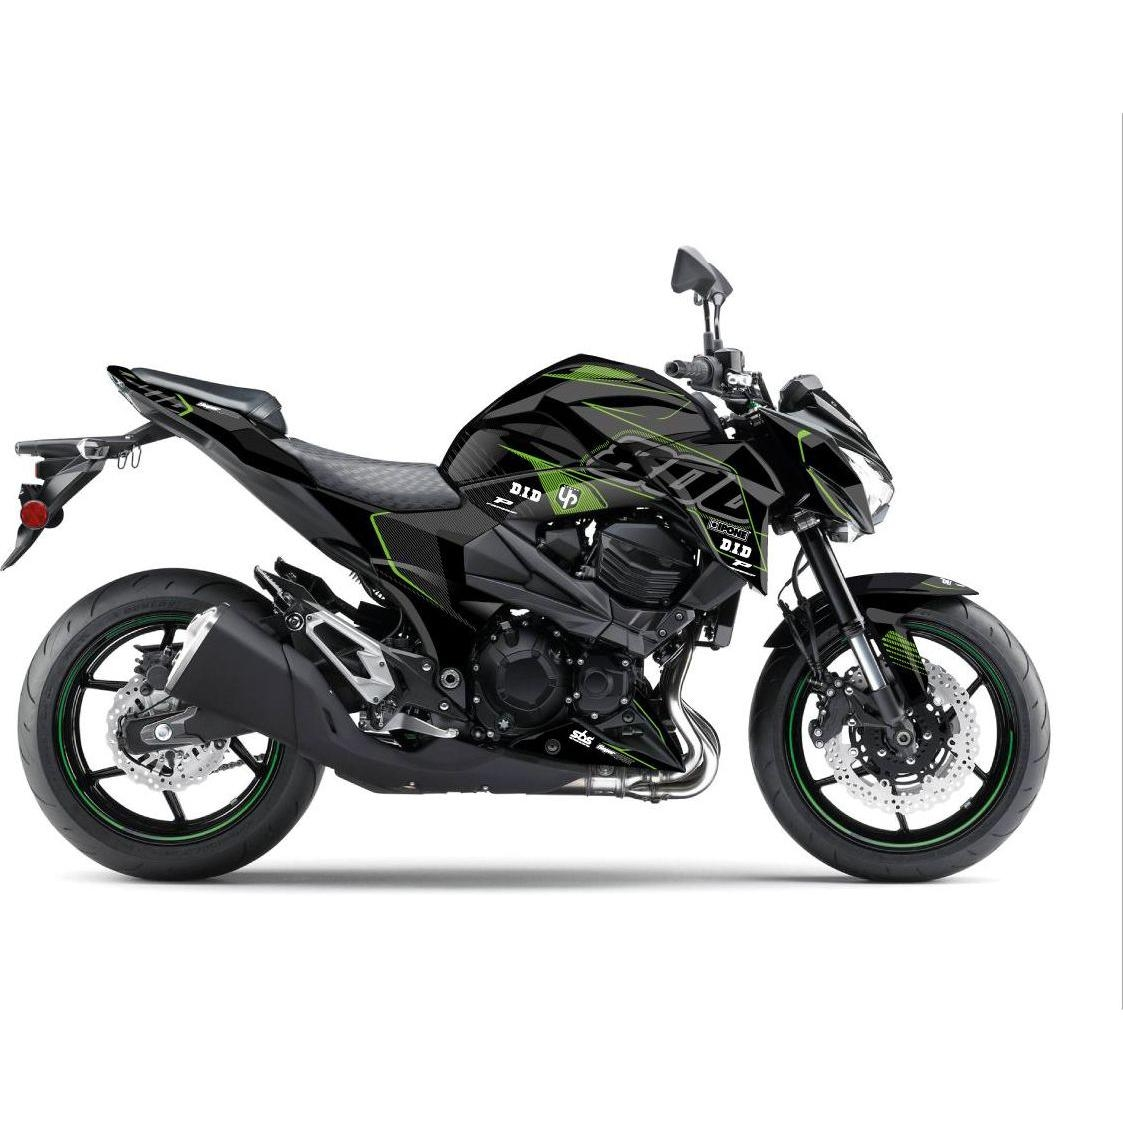 Kit déco Up Maximize noir / vert Kawasaki Z800 13-16